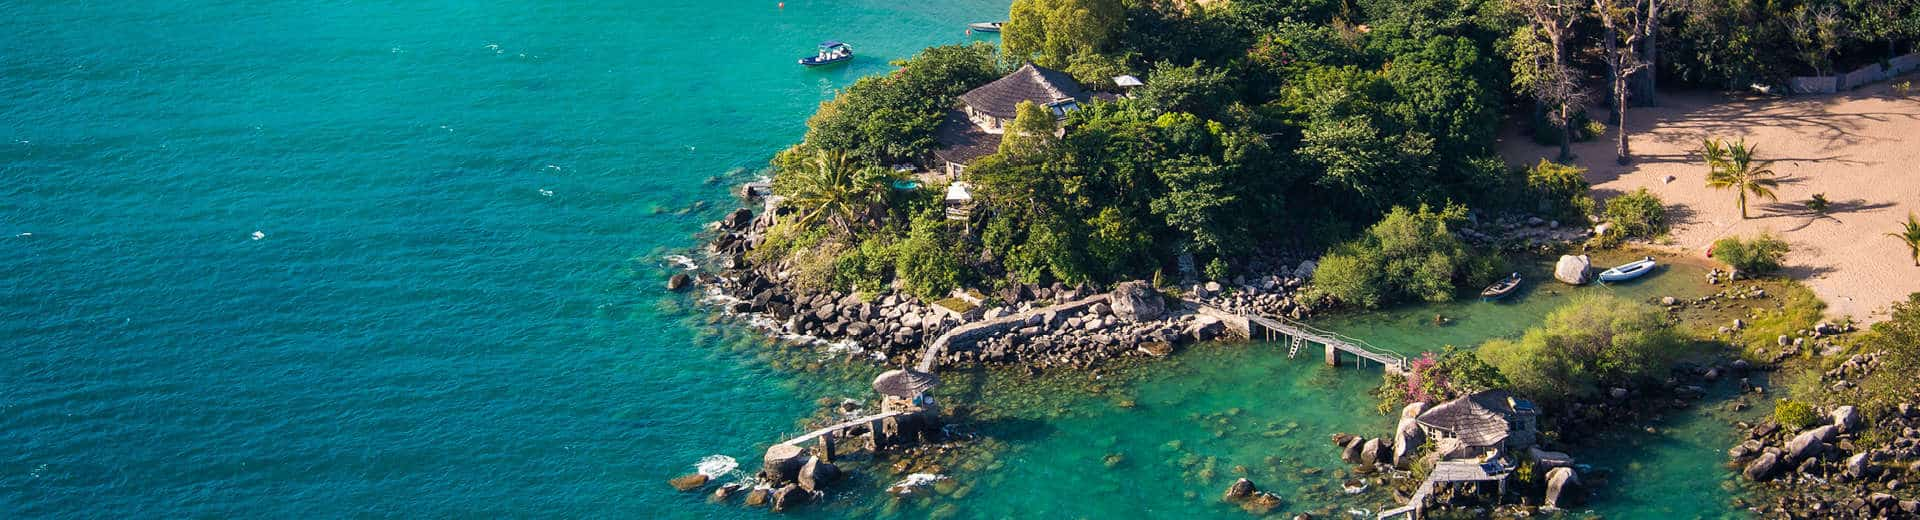 indagare insider journey giving back malawi and zambia likoma island